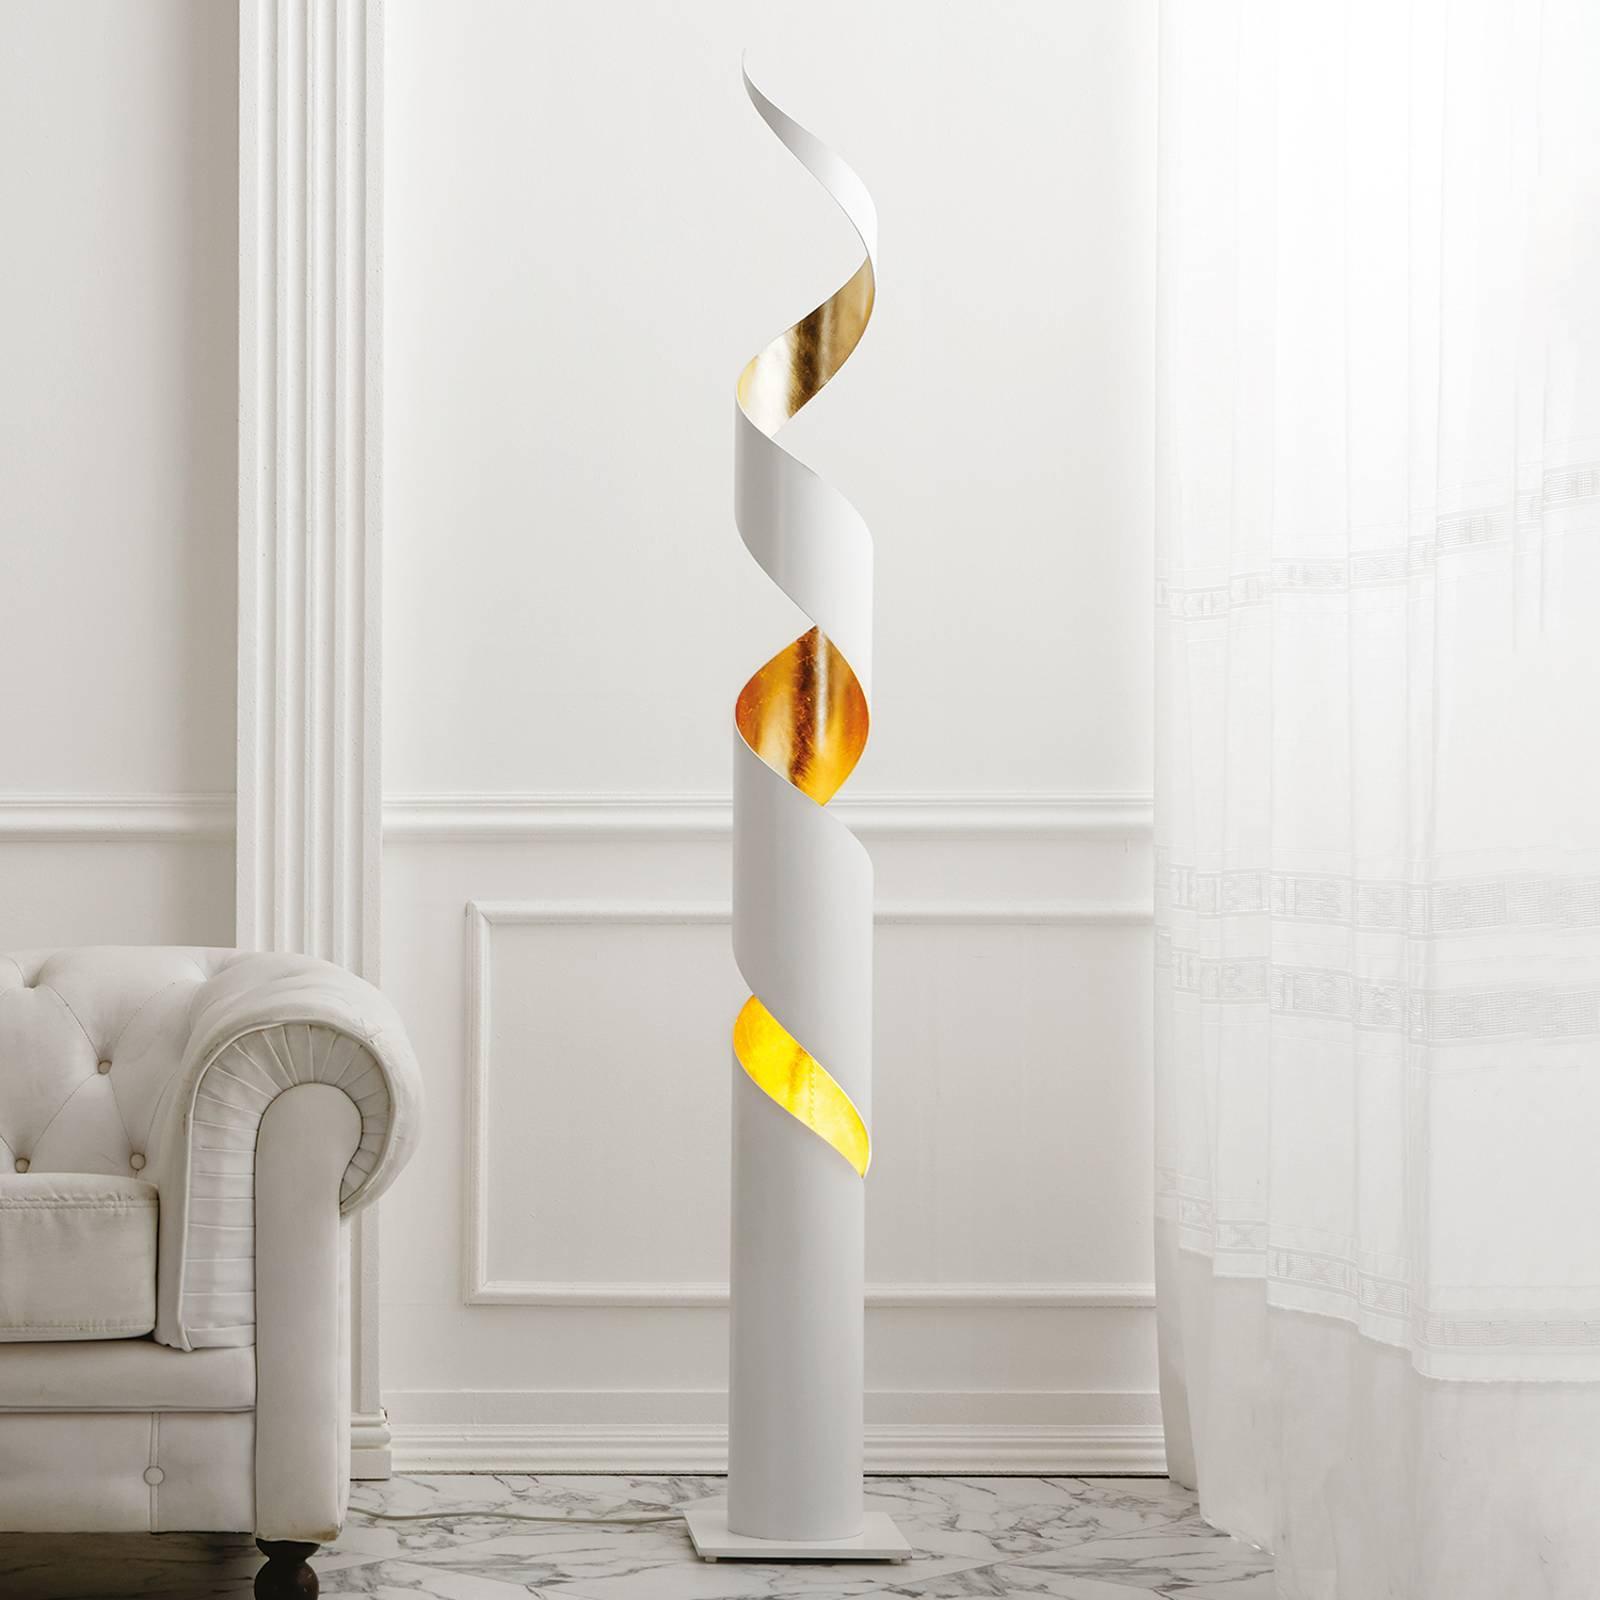 Remi eksklusiv hvit-gullfarget gulvlampe